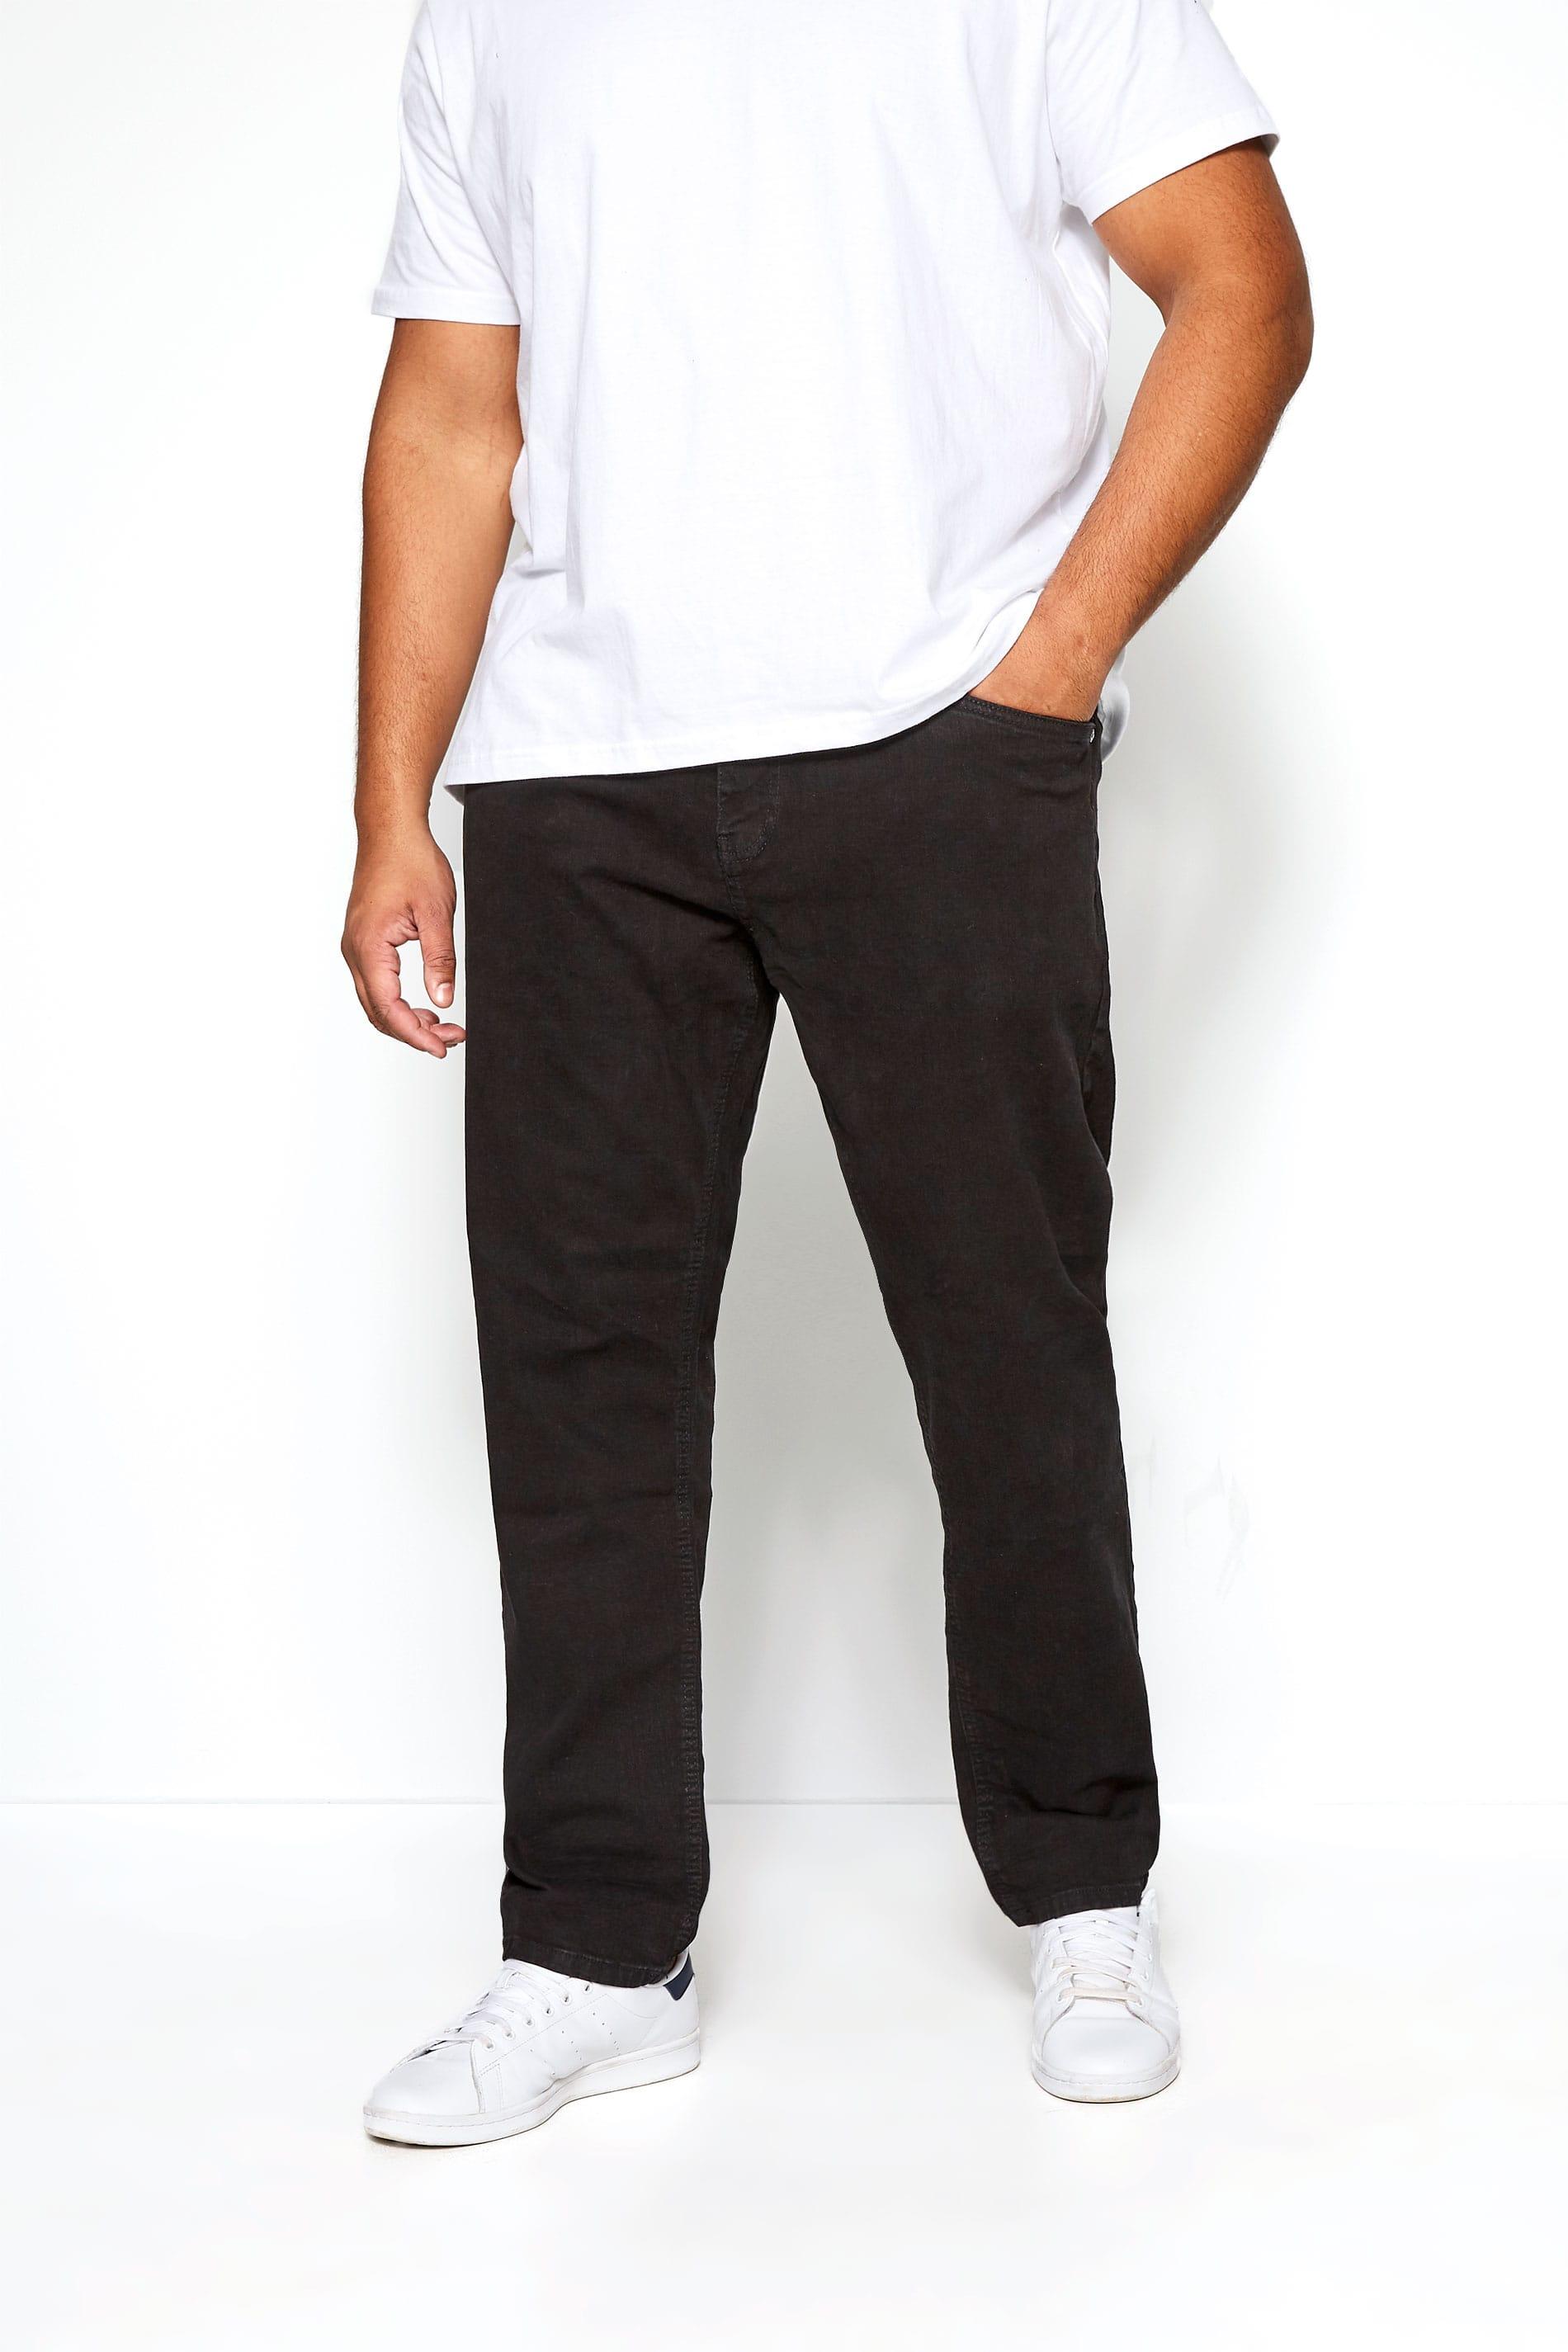 KANGOL Blackwash Slim Fit Jeans